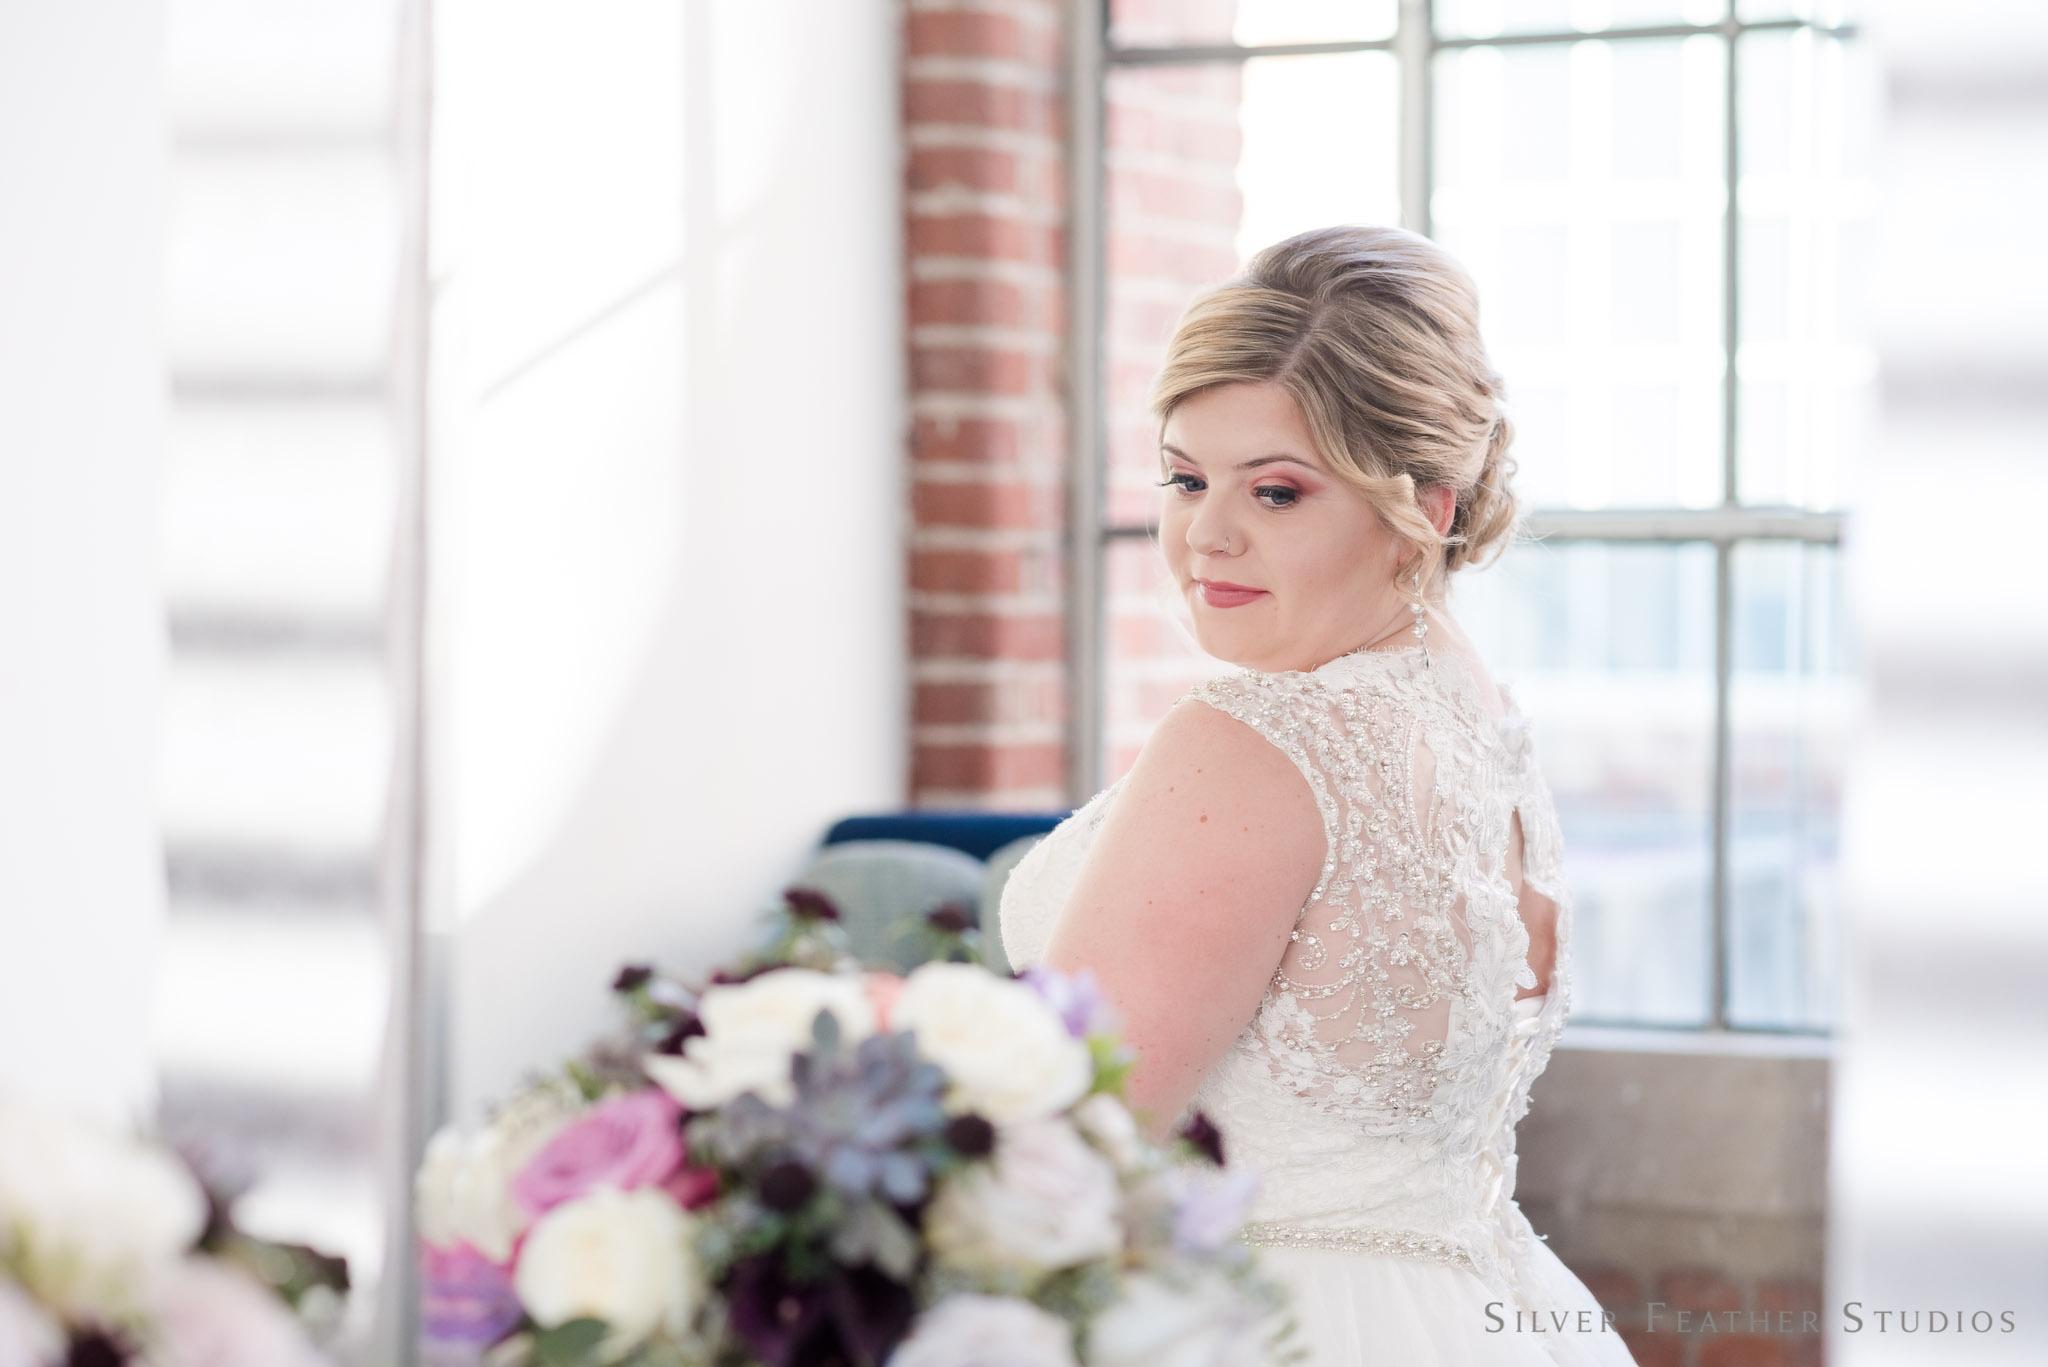 cottom-room-wedding-photography-007.jpg